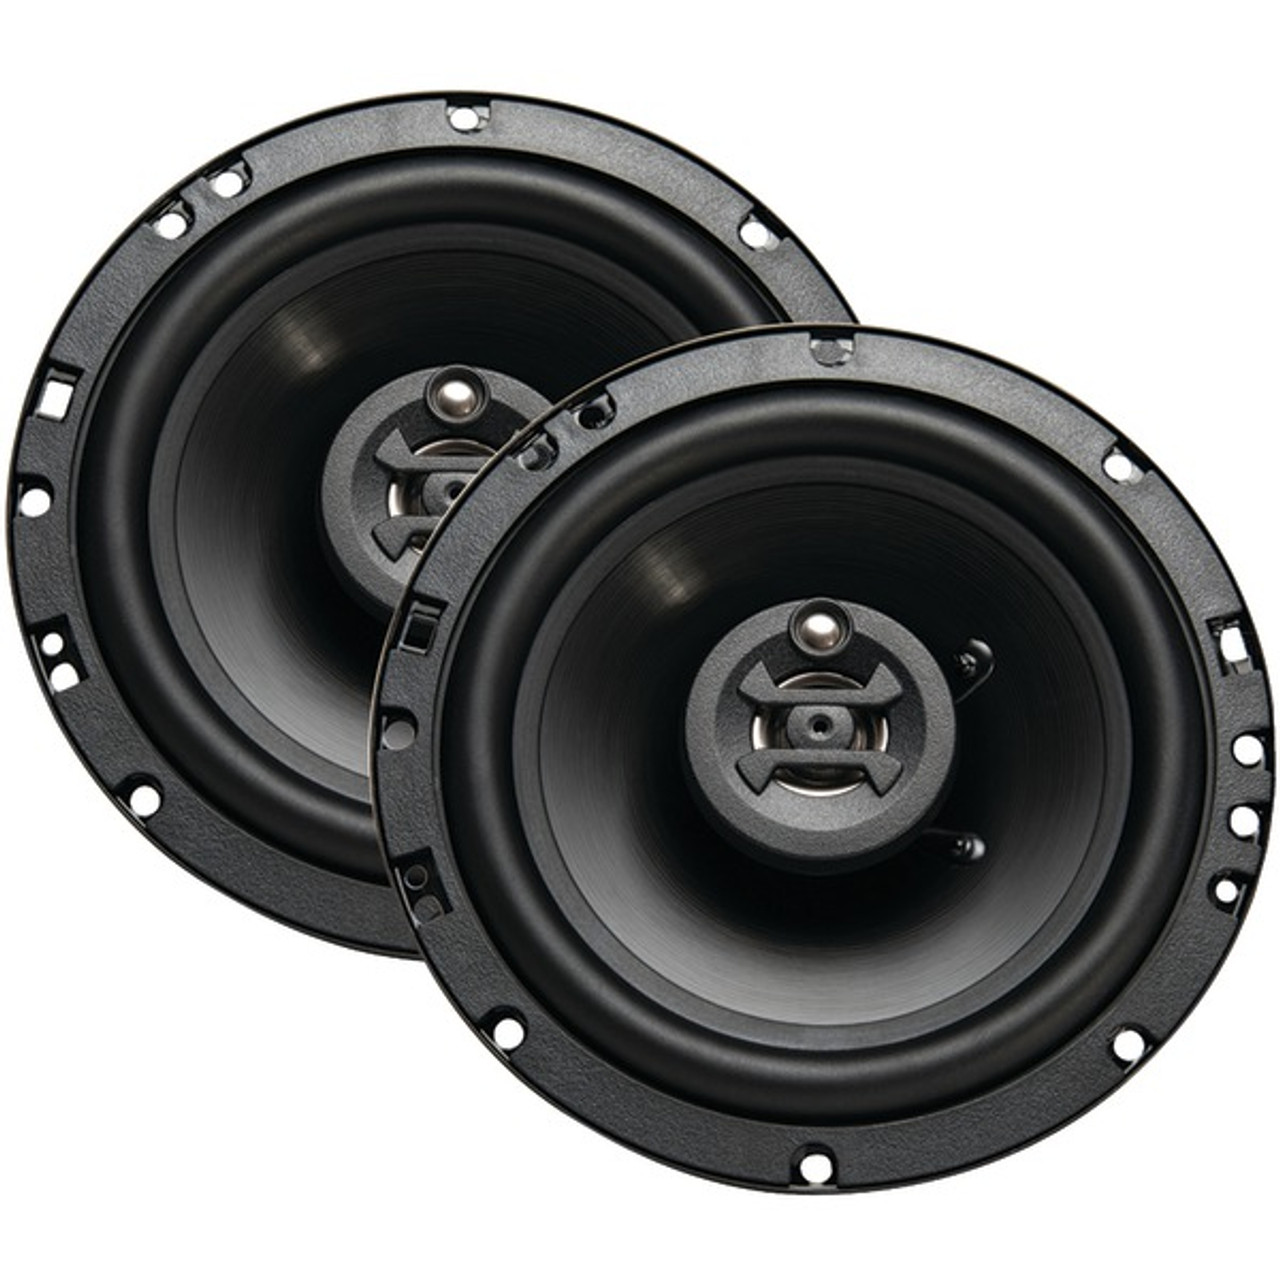 HIFONICS ZS653 Zeus Series Coaxial 4ohm Speakers (6 5